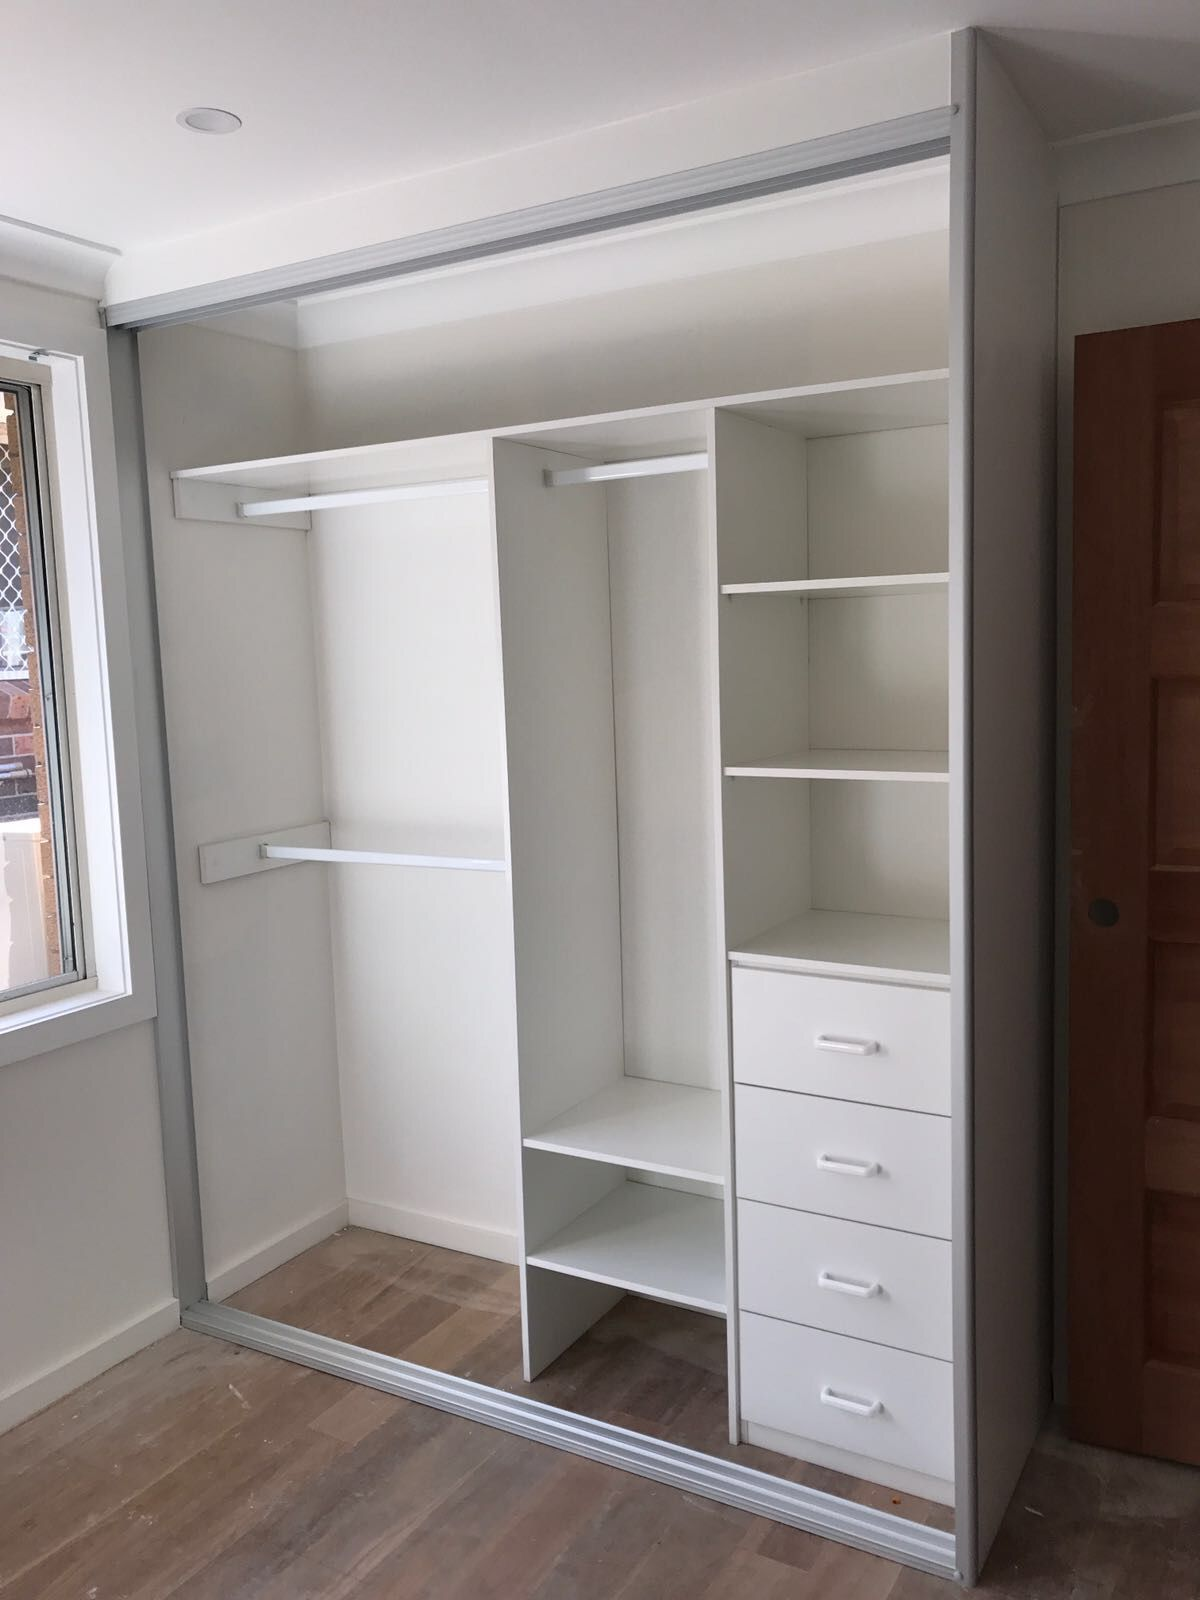 Storage Solutions Fantastic Built In Wardrobes Build A Closet